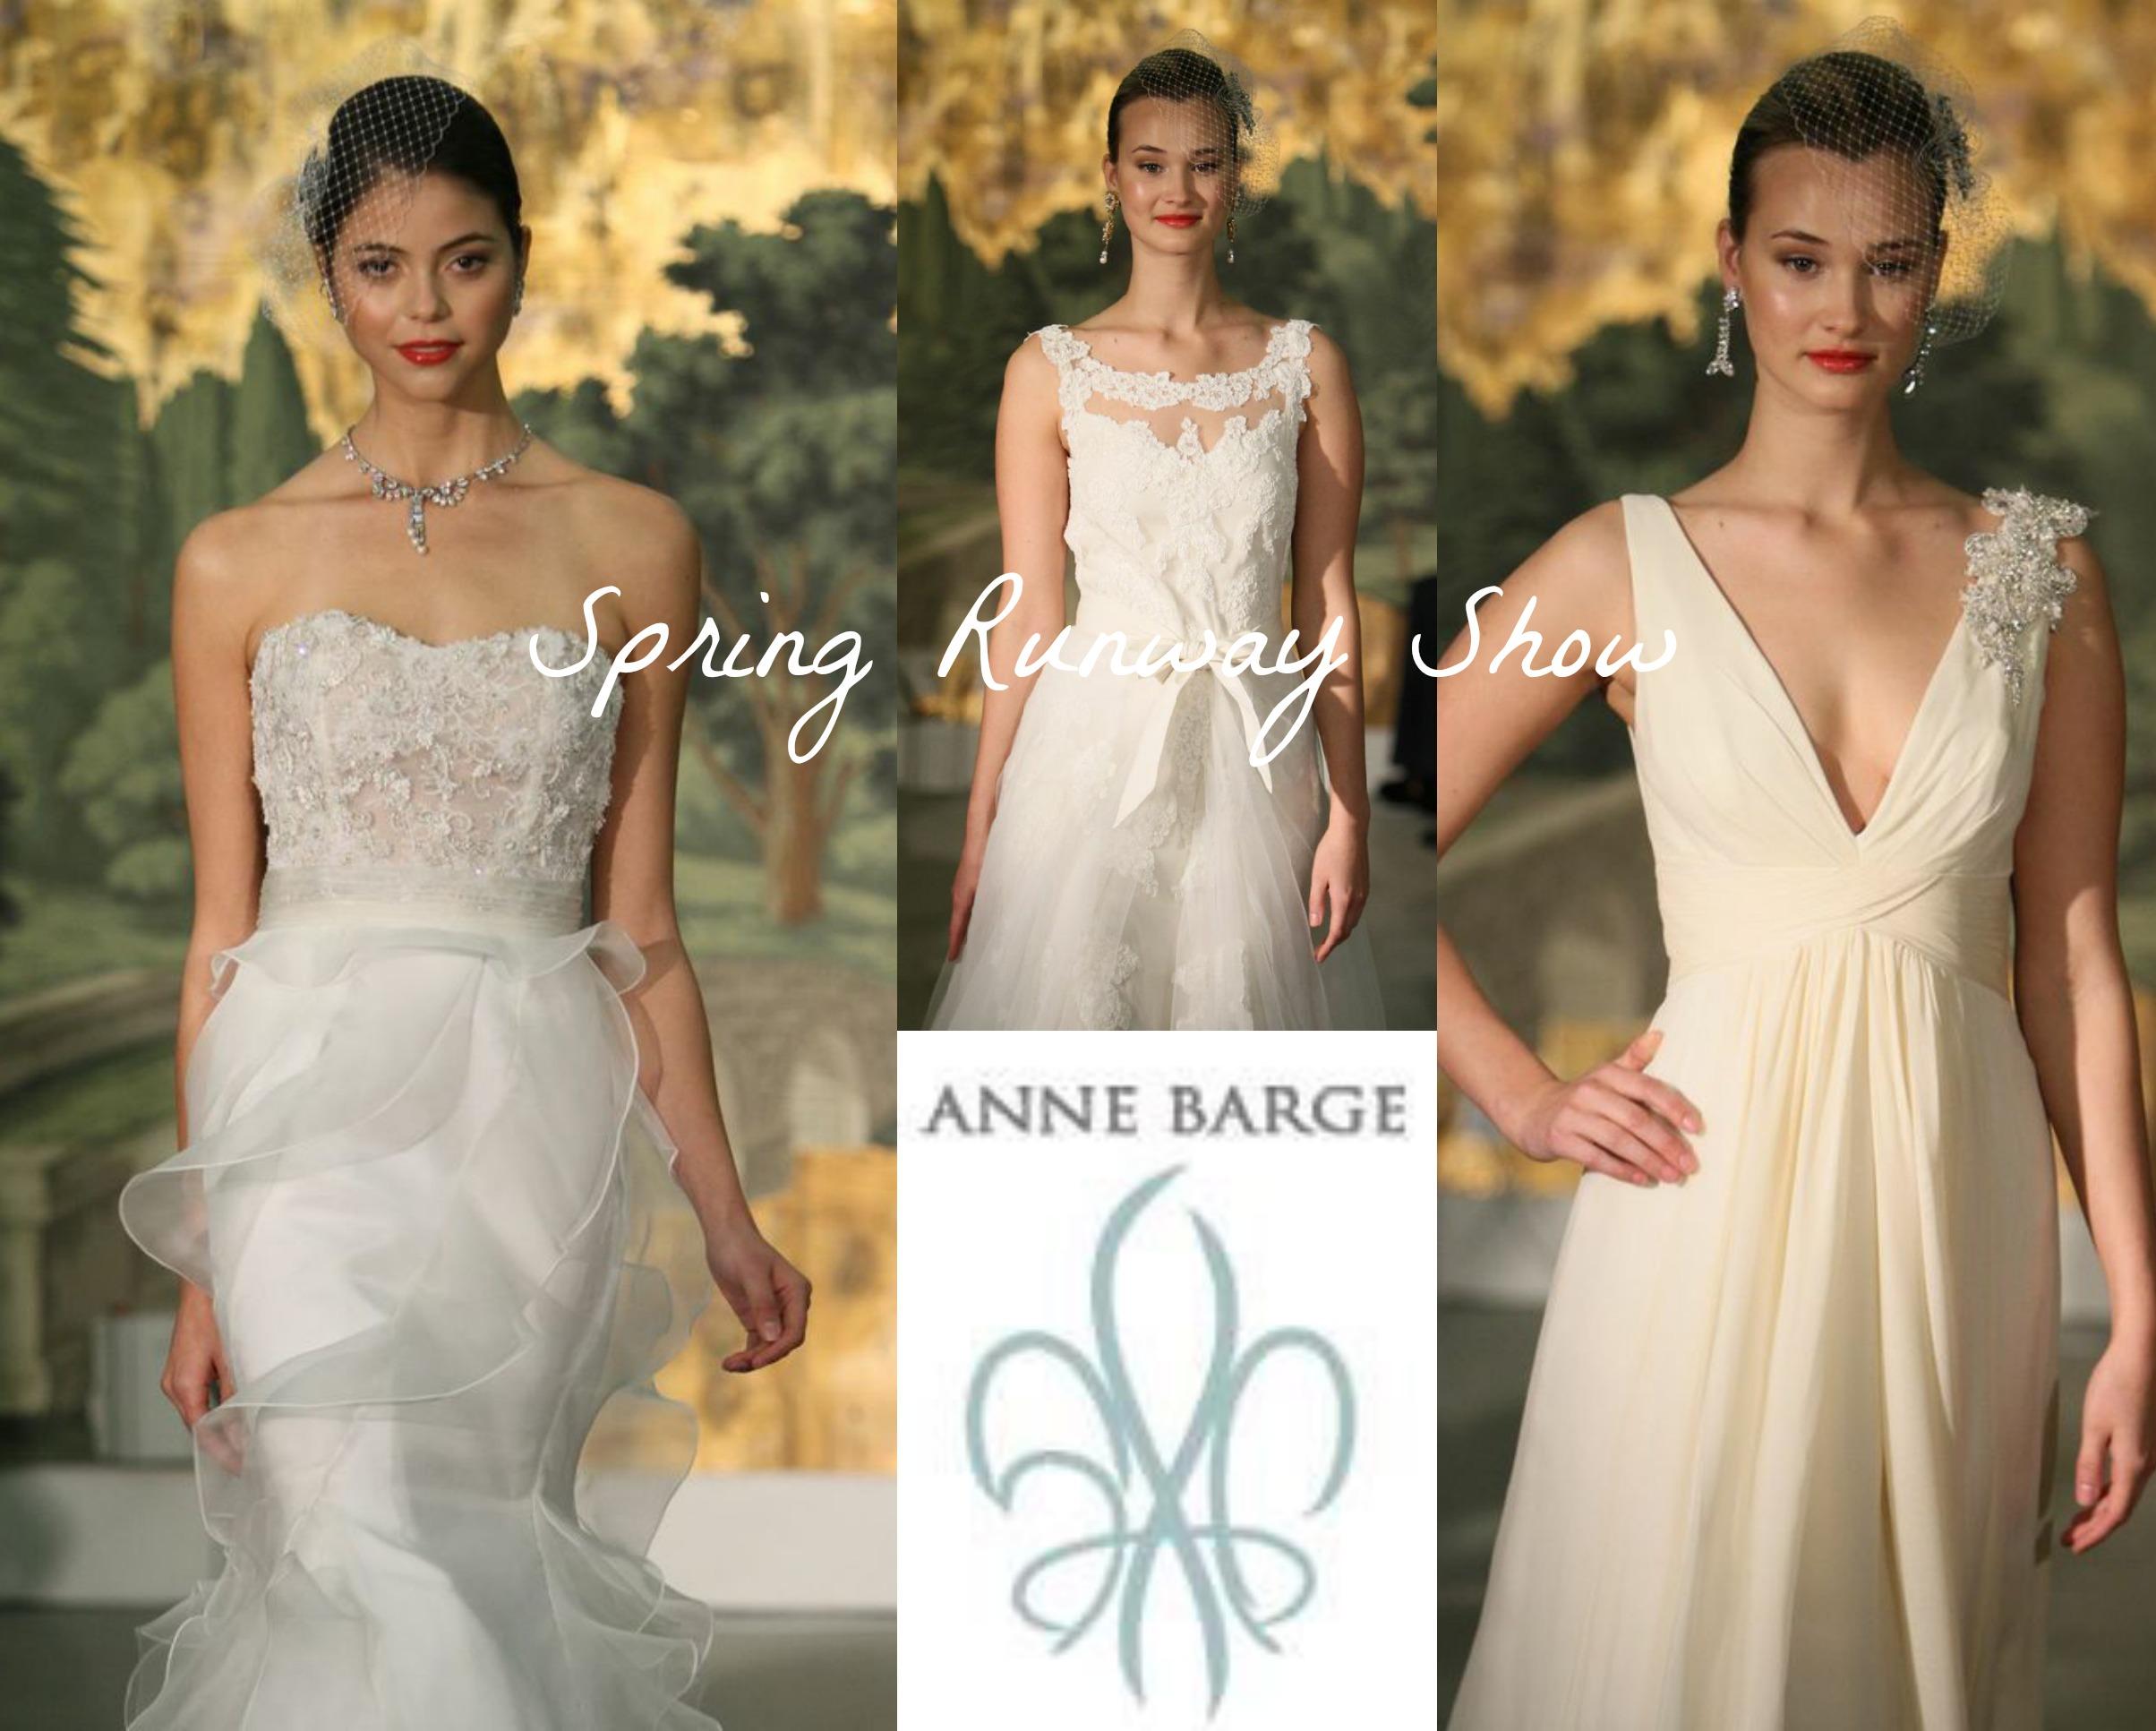 Anne Barge